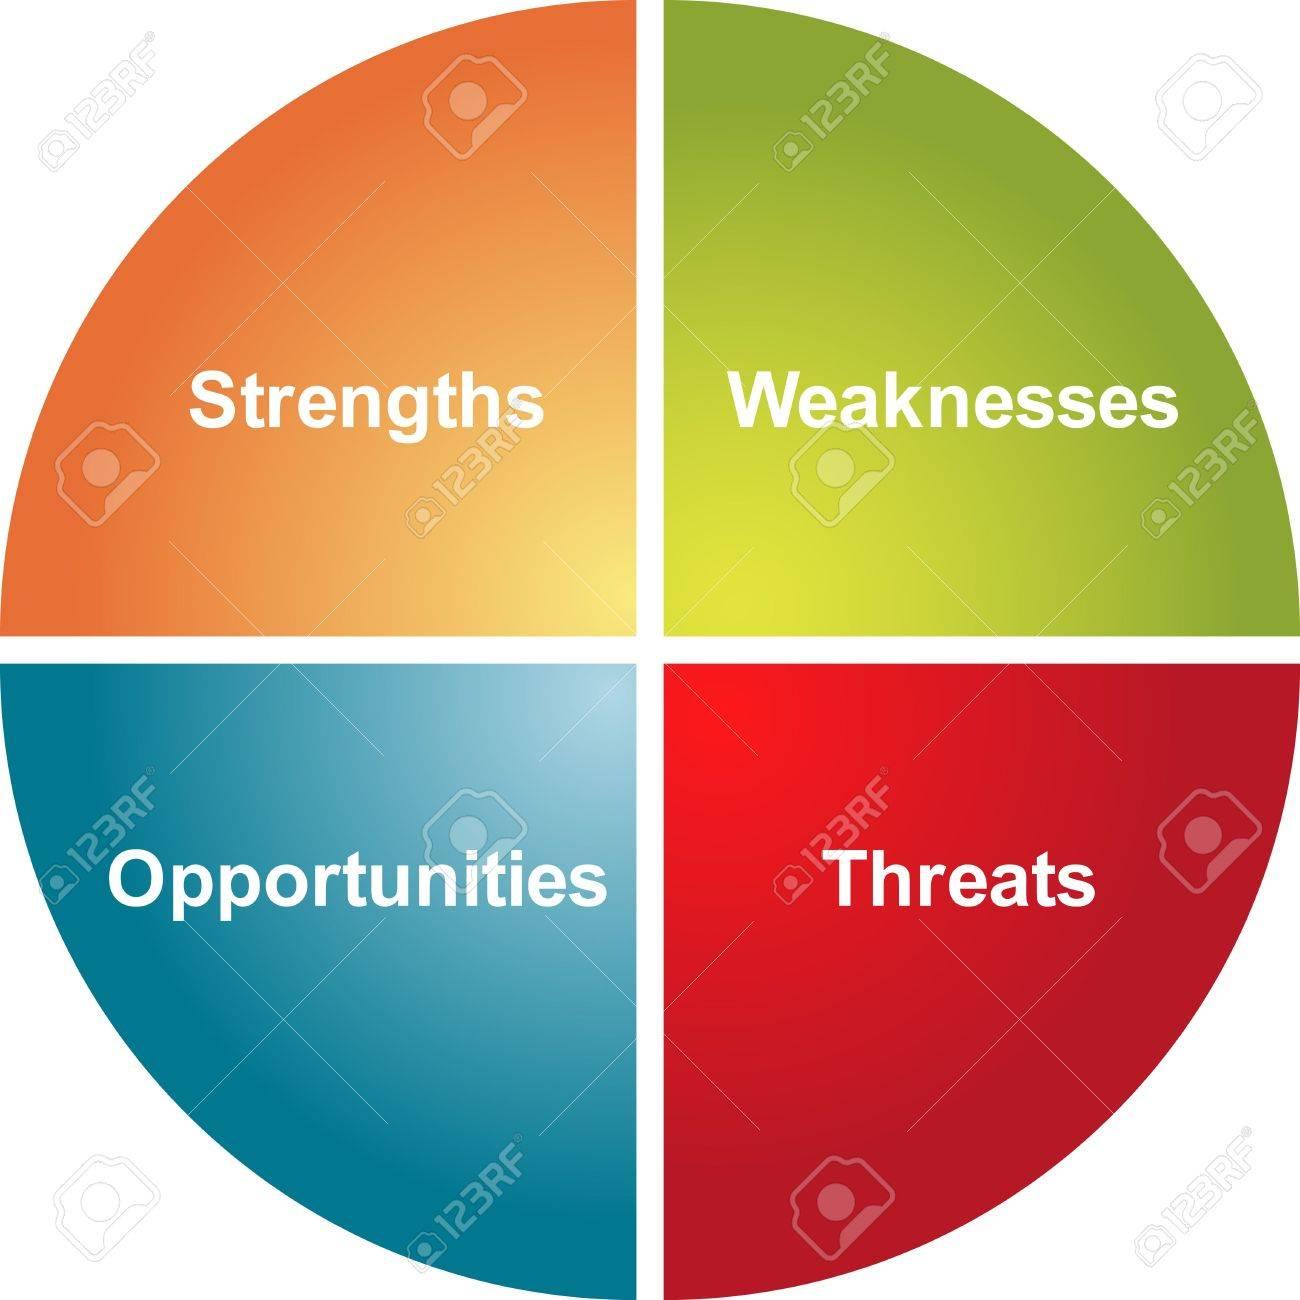 swot analysis business strategy management process concept diagram illustration swot analysis business strategy management process concept diagram illustration